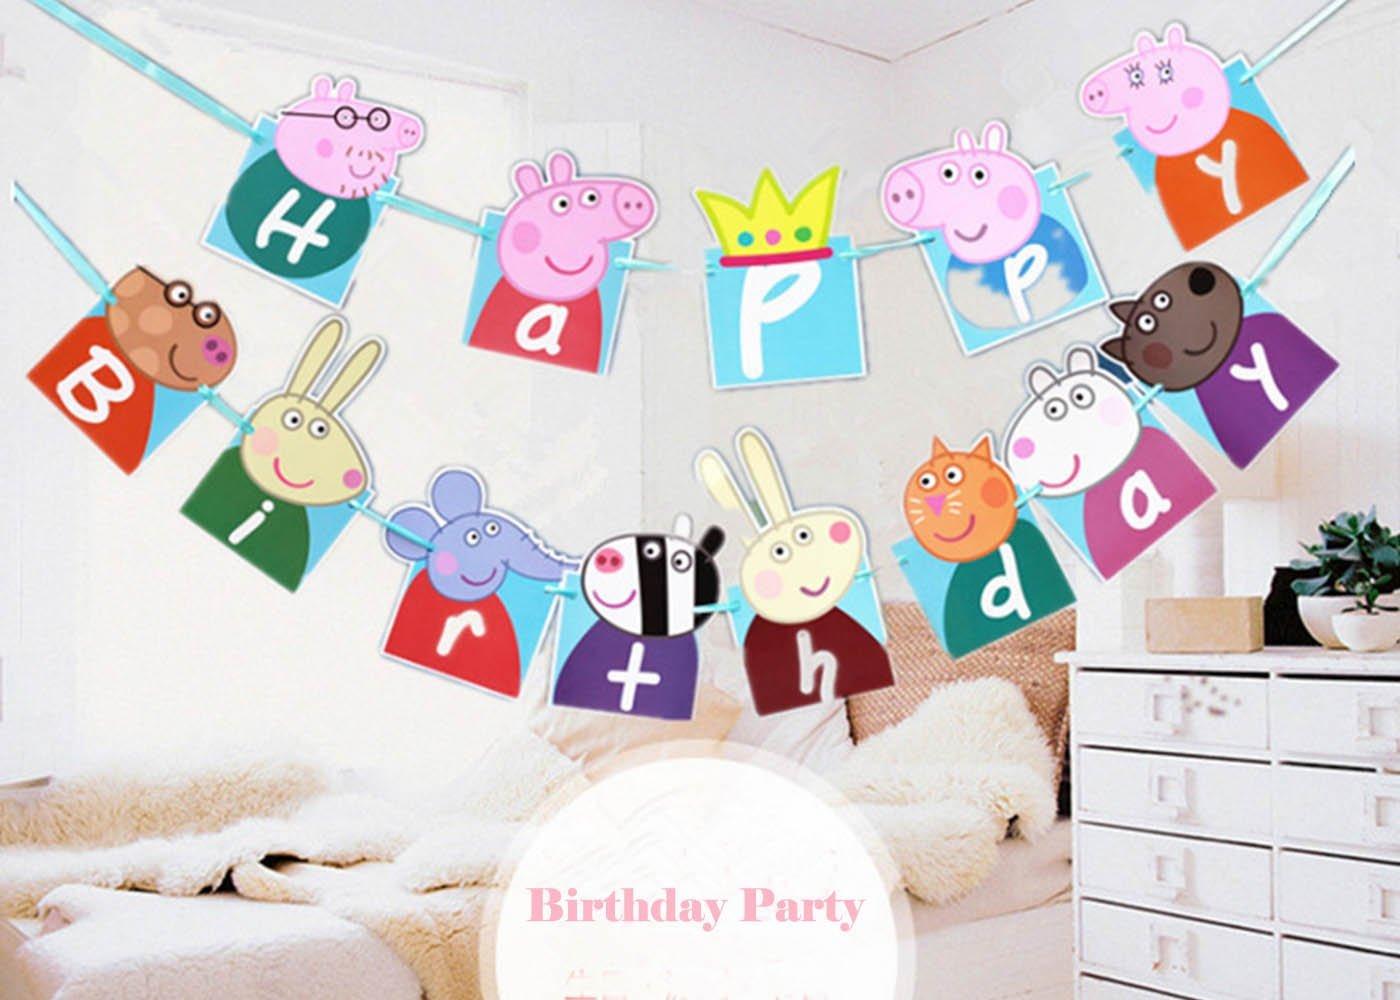 Buy Efivs Arts Cute Peppa Pig Theme Party Decorative Happy Birthday